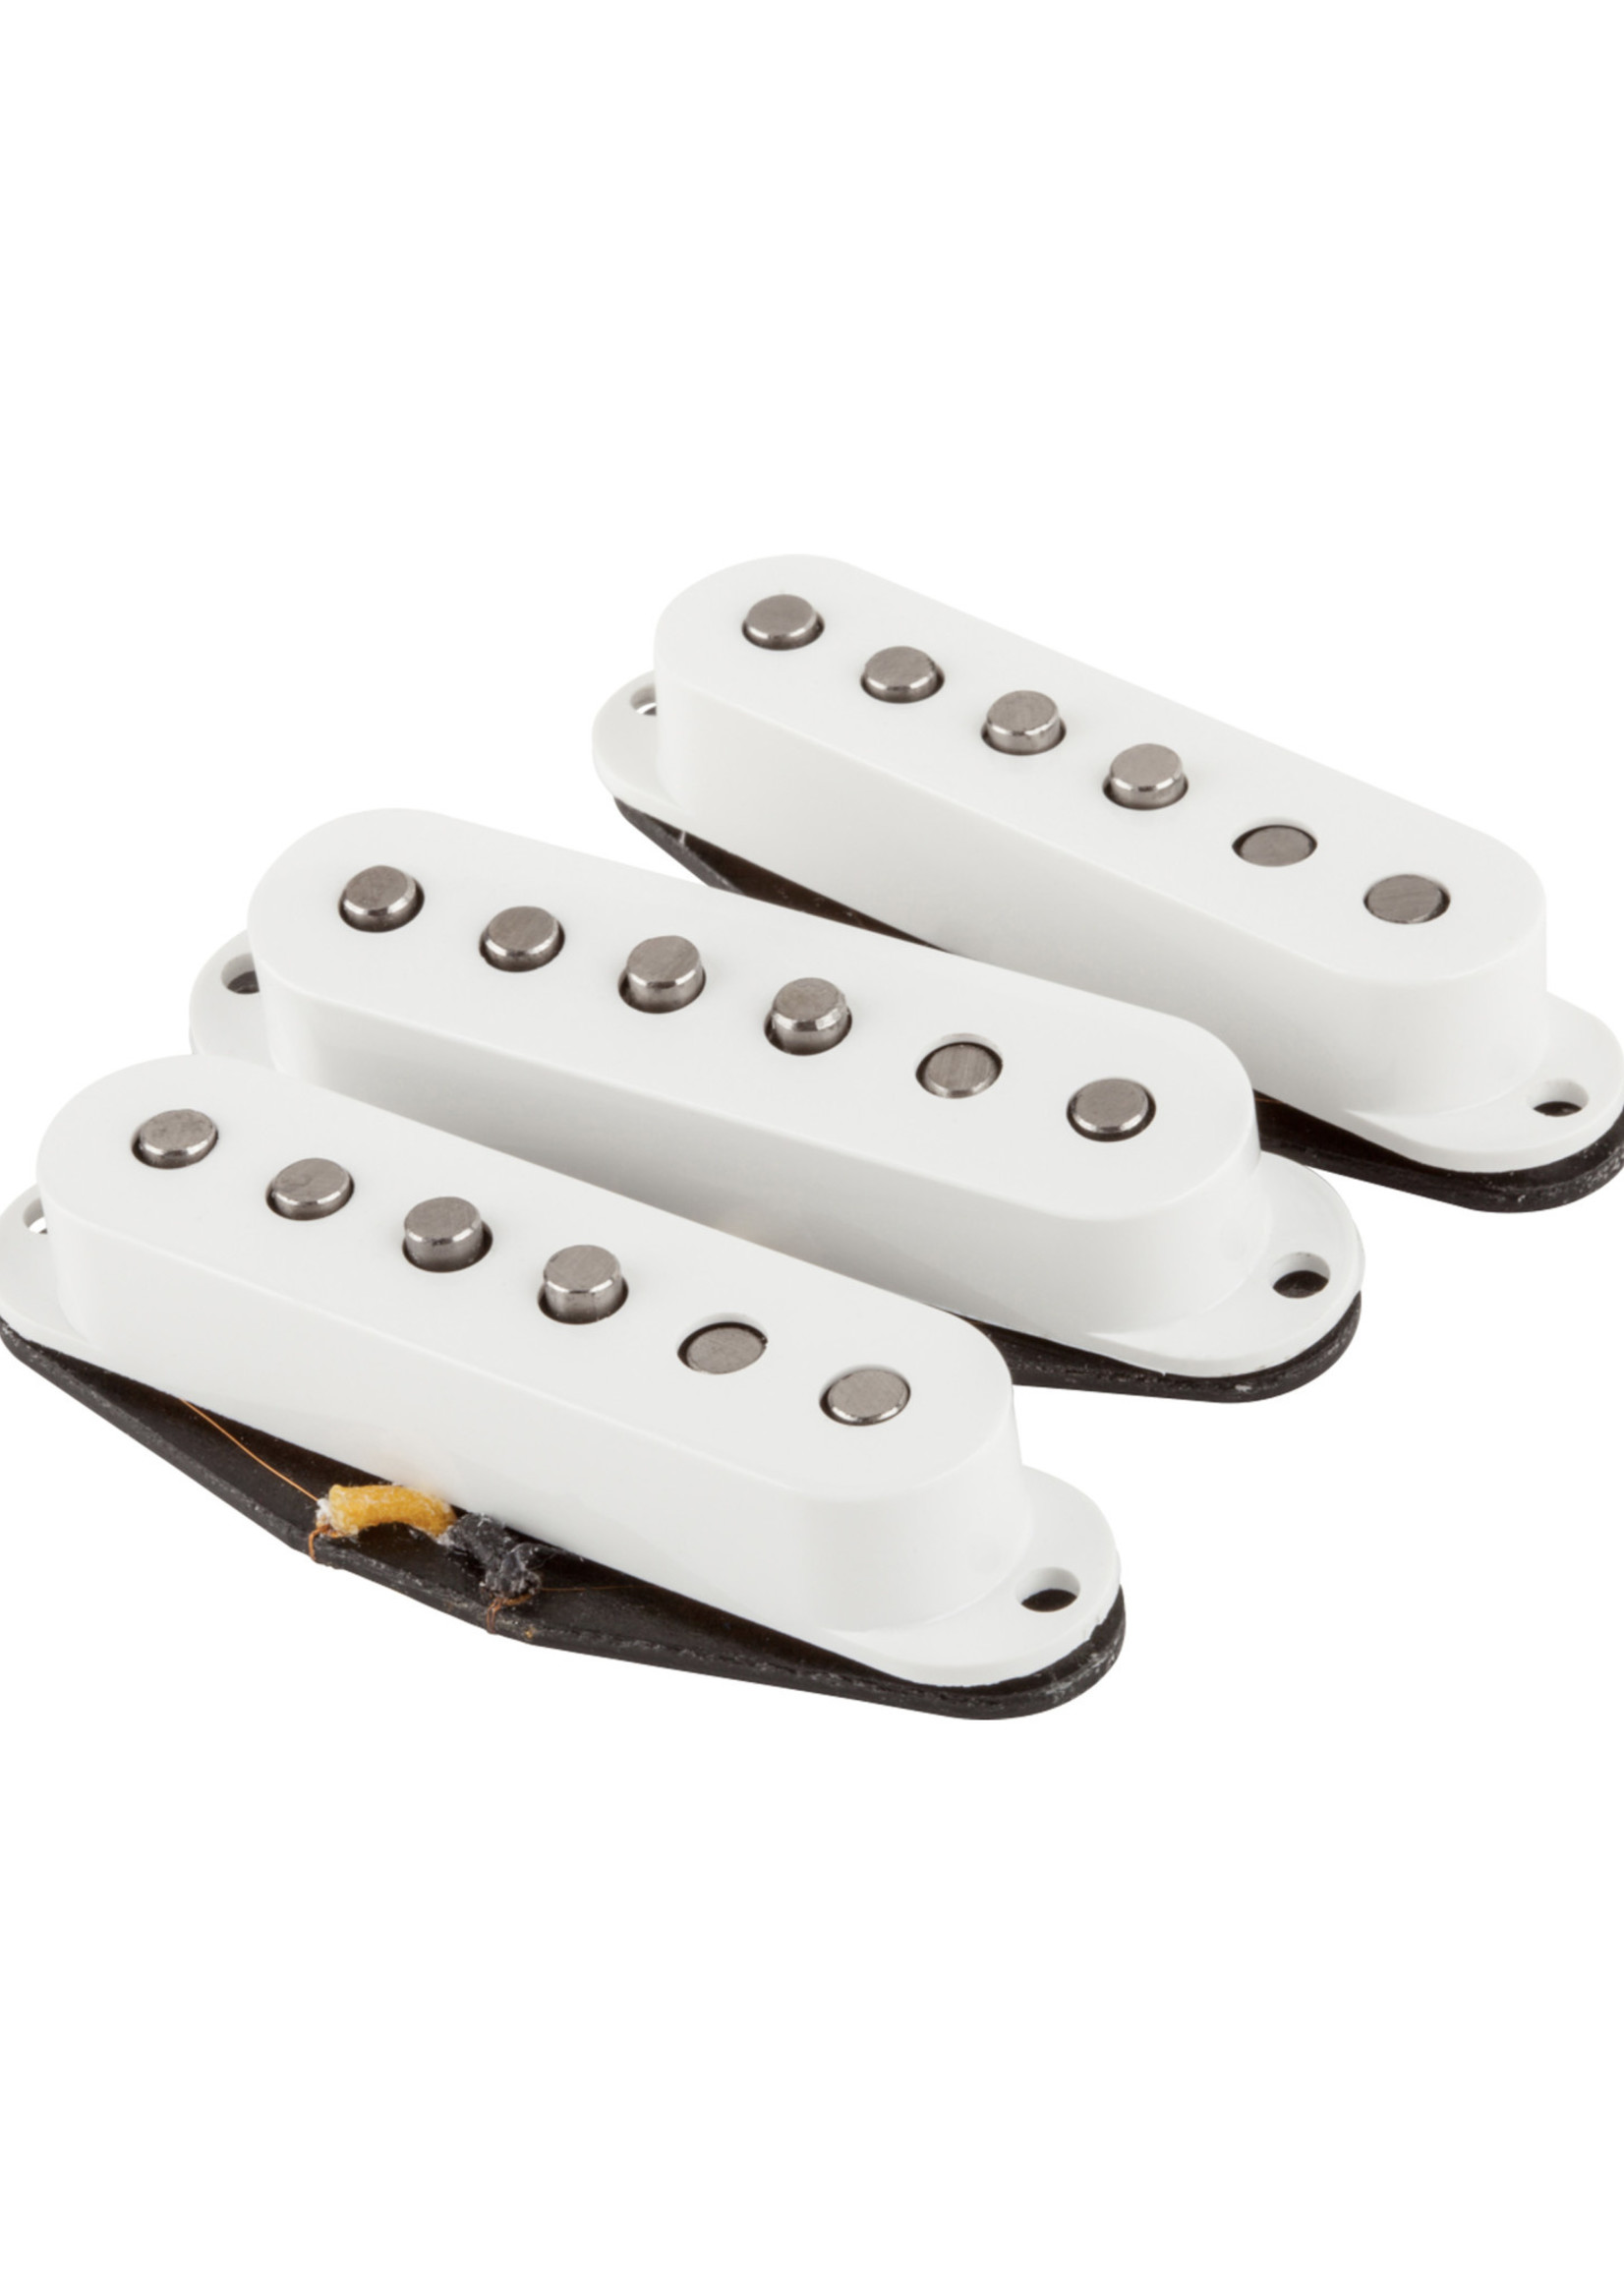 Fender Fender Custom Shop Fat 50's Pickup Set